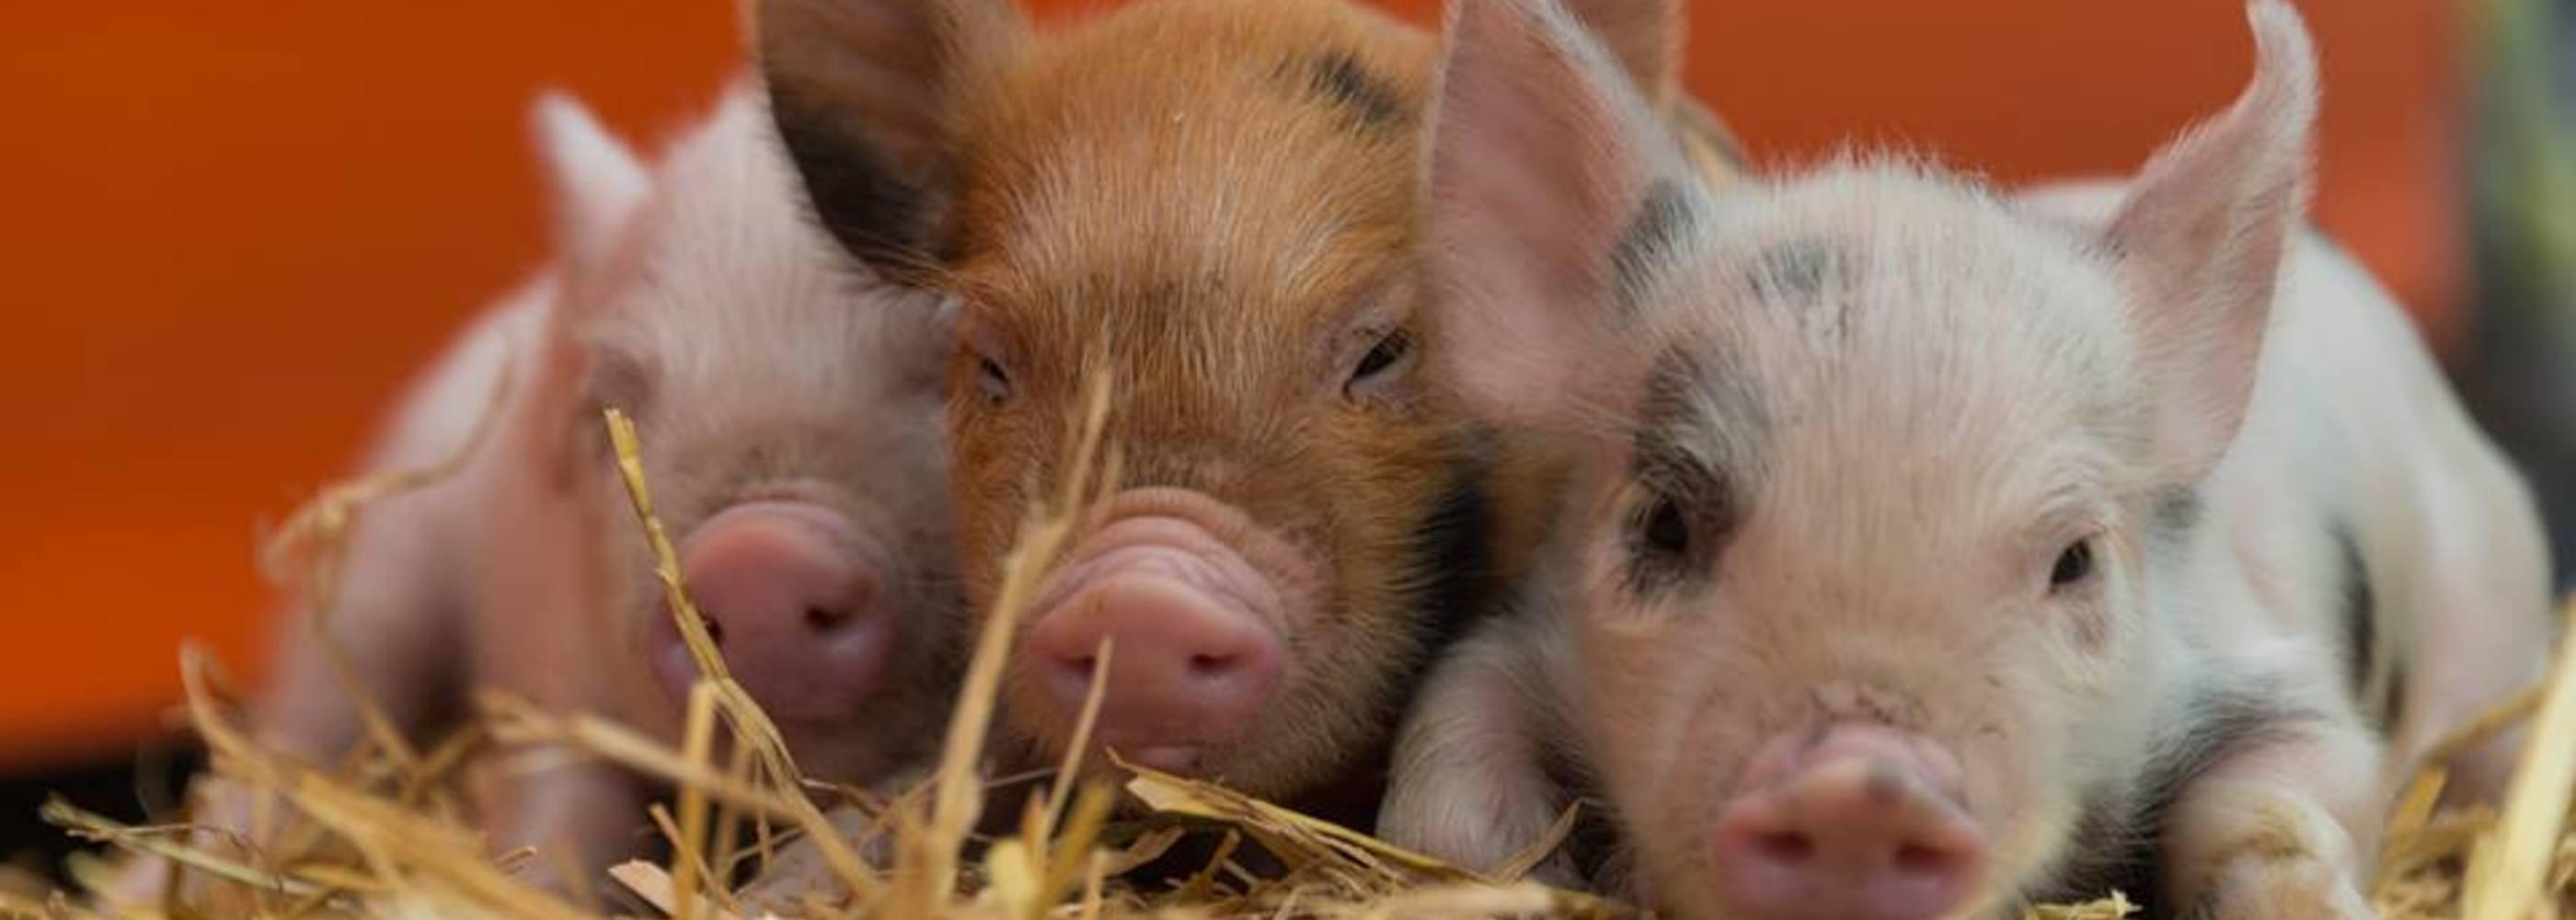 Widgety Cricket Circuit Round Boar Longdown Activity Farm